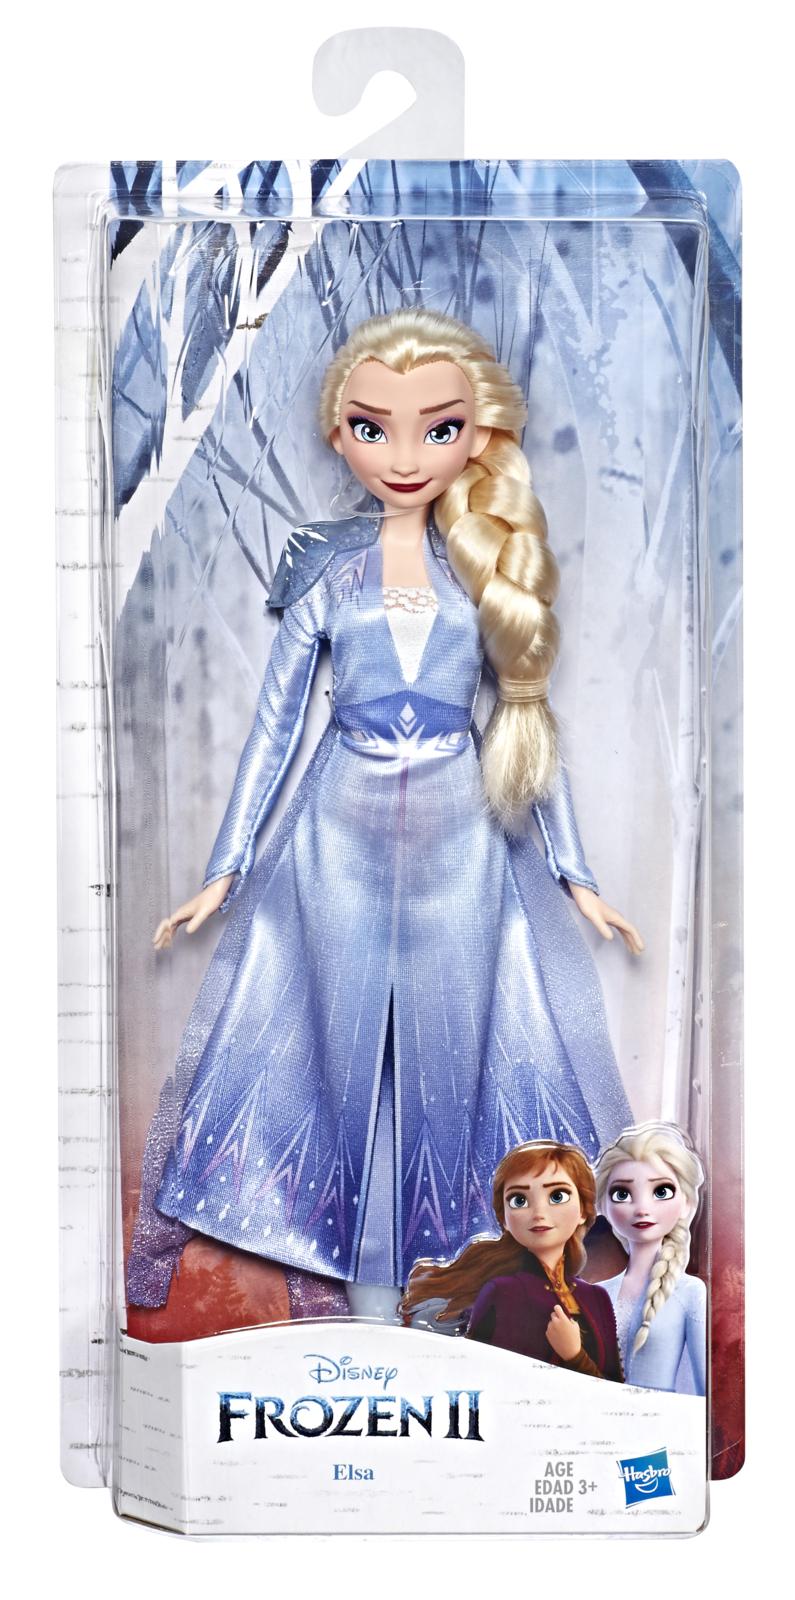 Frozen II: Elsa - Character Doll image